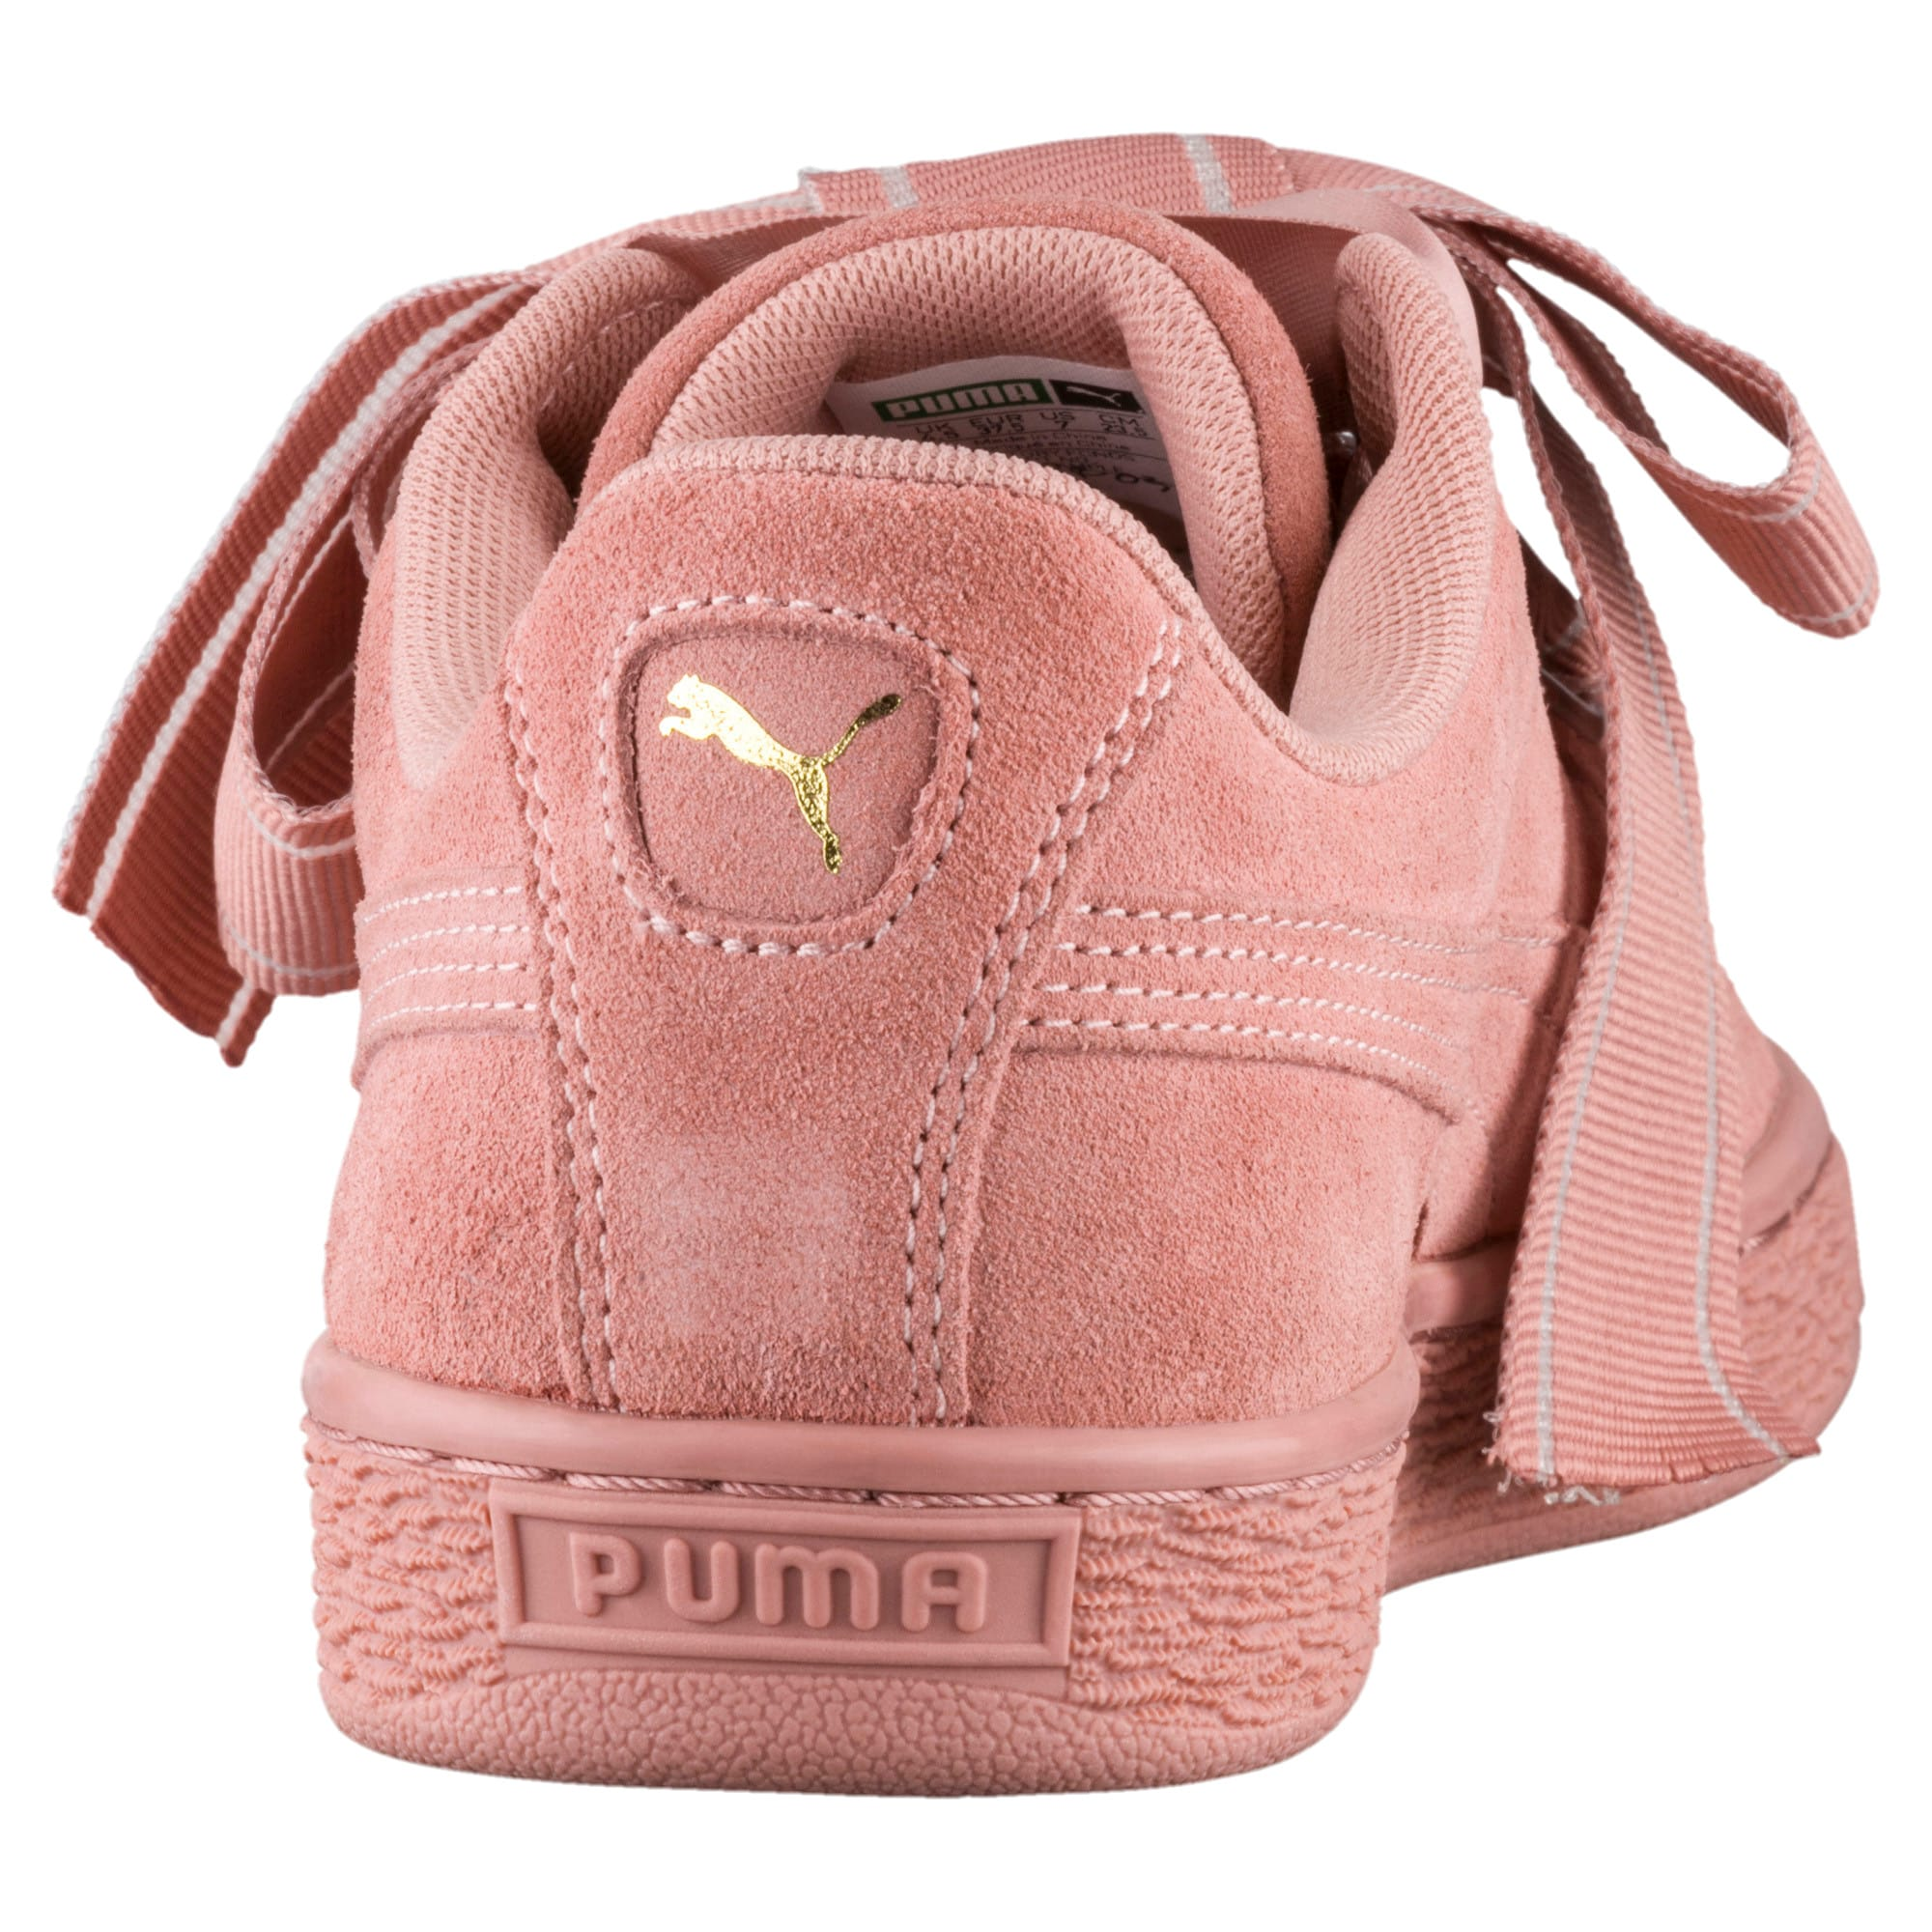 Thumbnail 4 of Suede Heart Satin II Women's Sneakers, Cameo Brown-Cameo Brown, medium